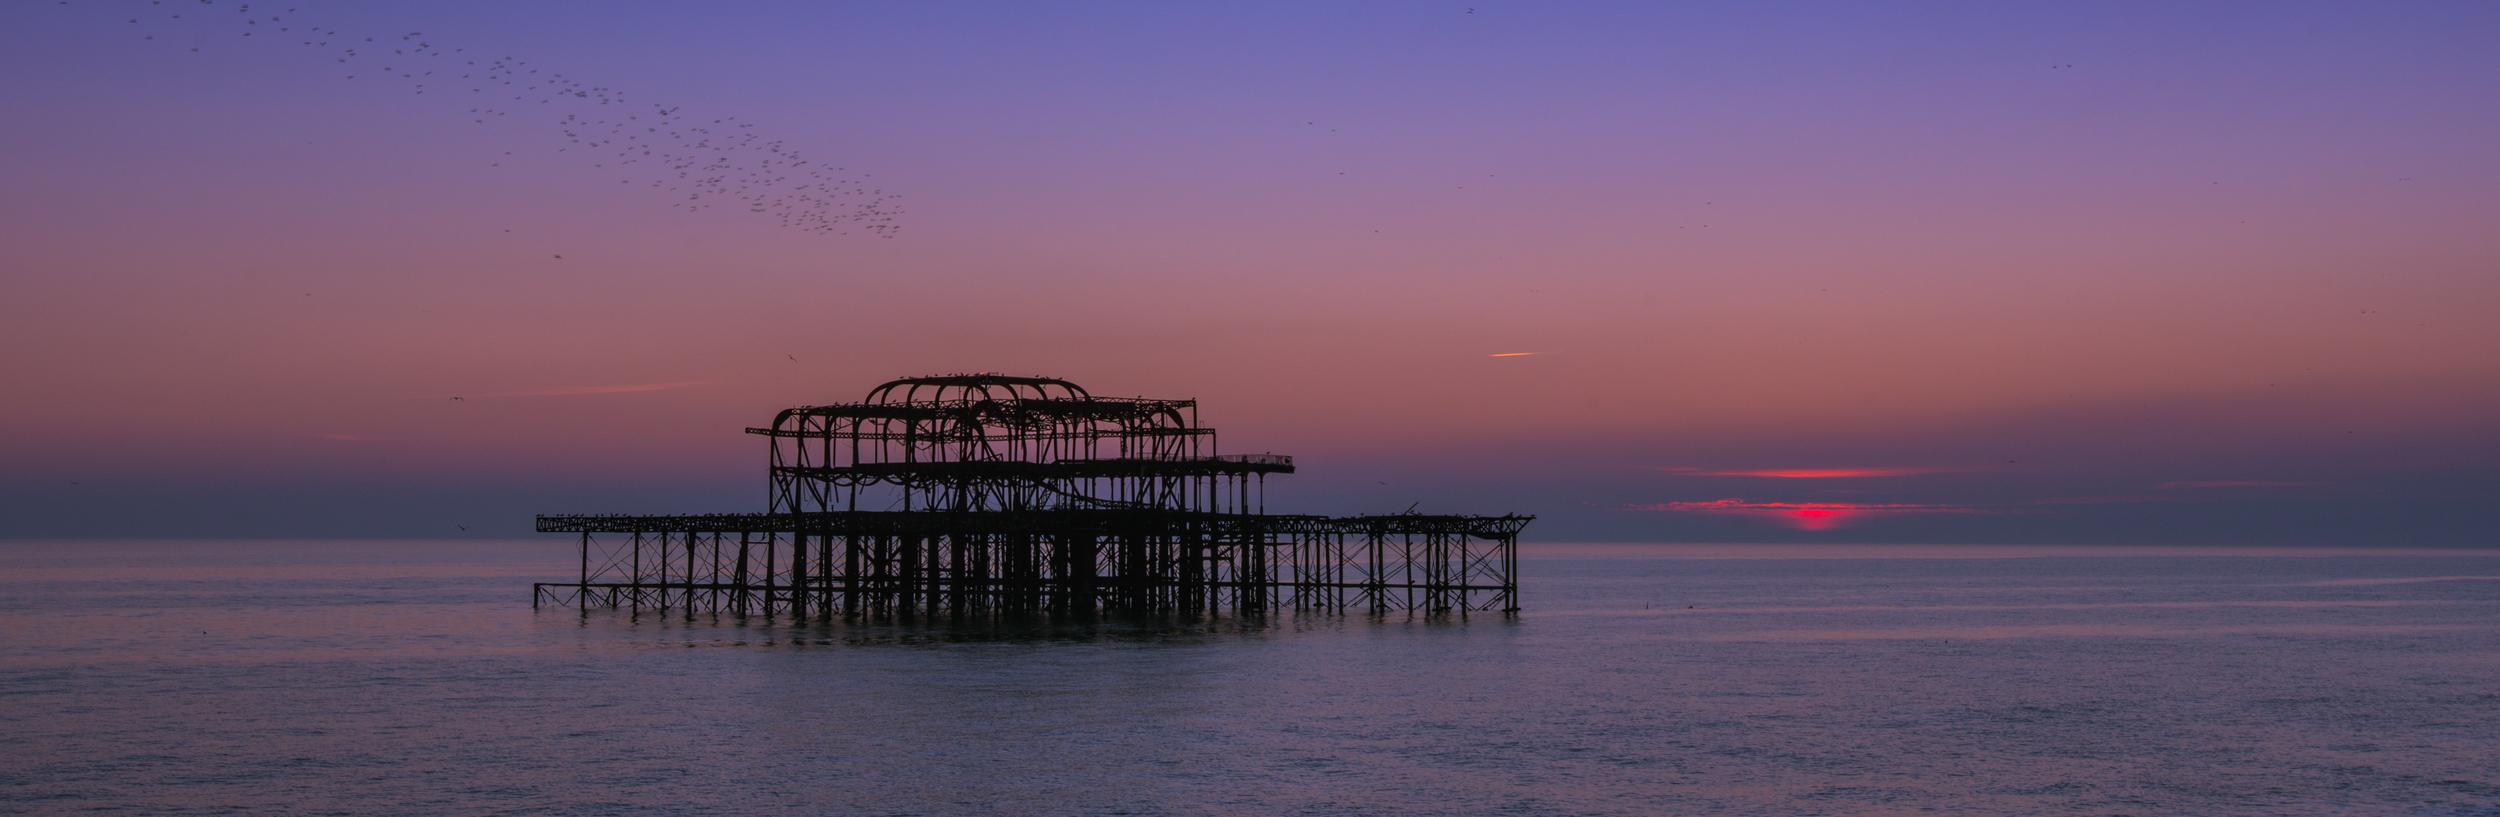 West Pier Feb Sunset 1.jpg